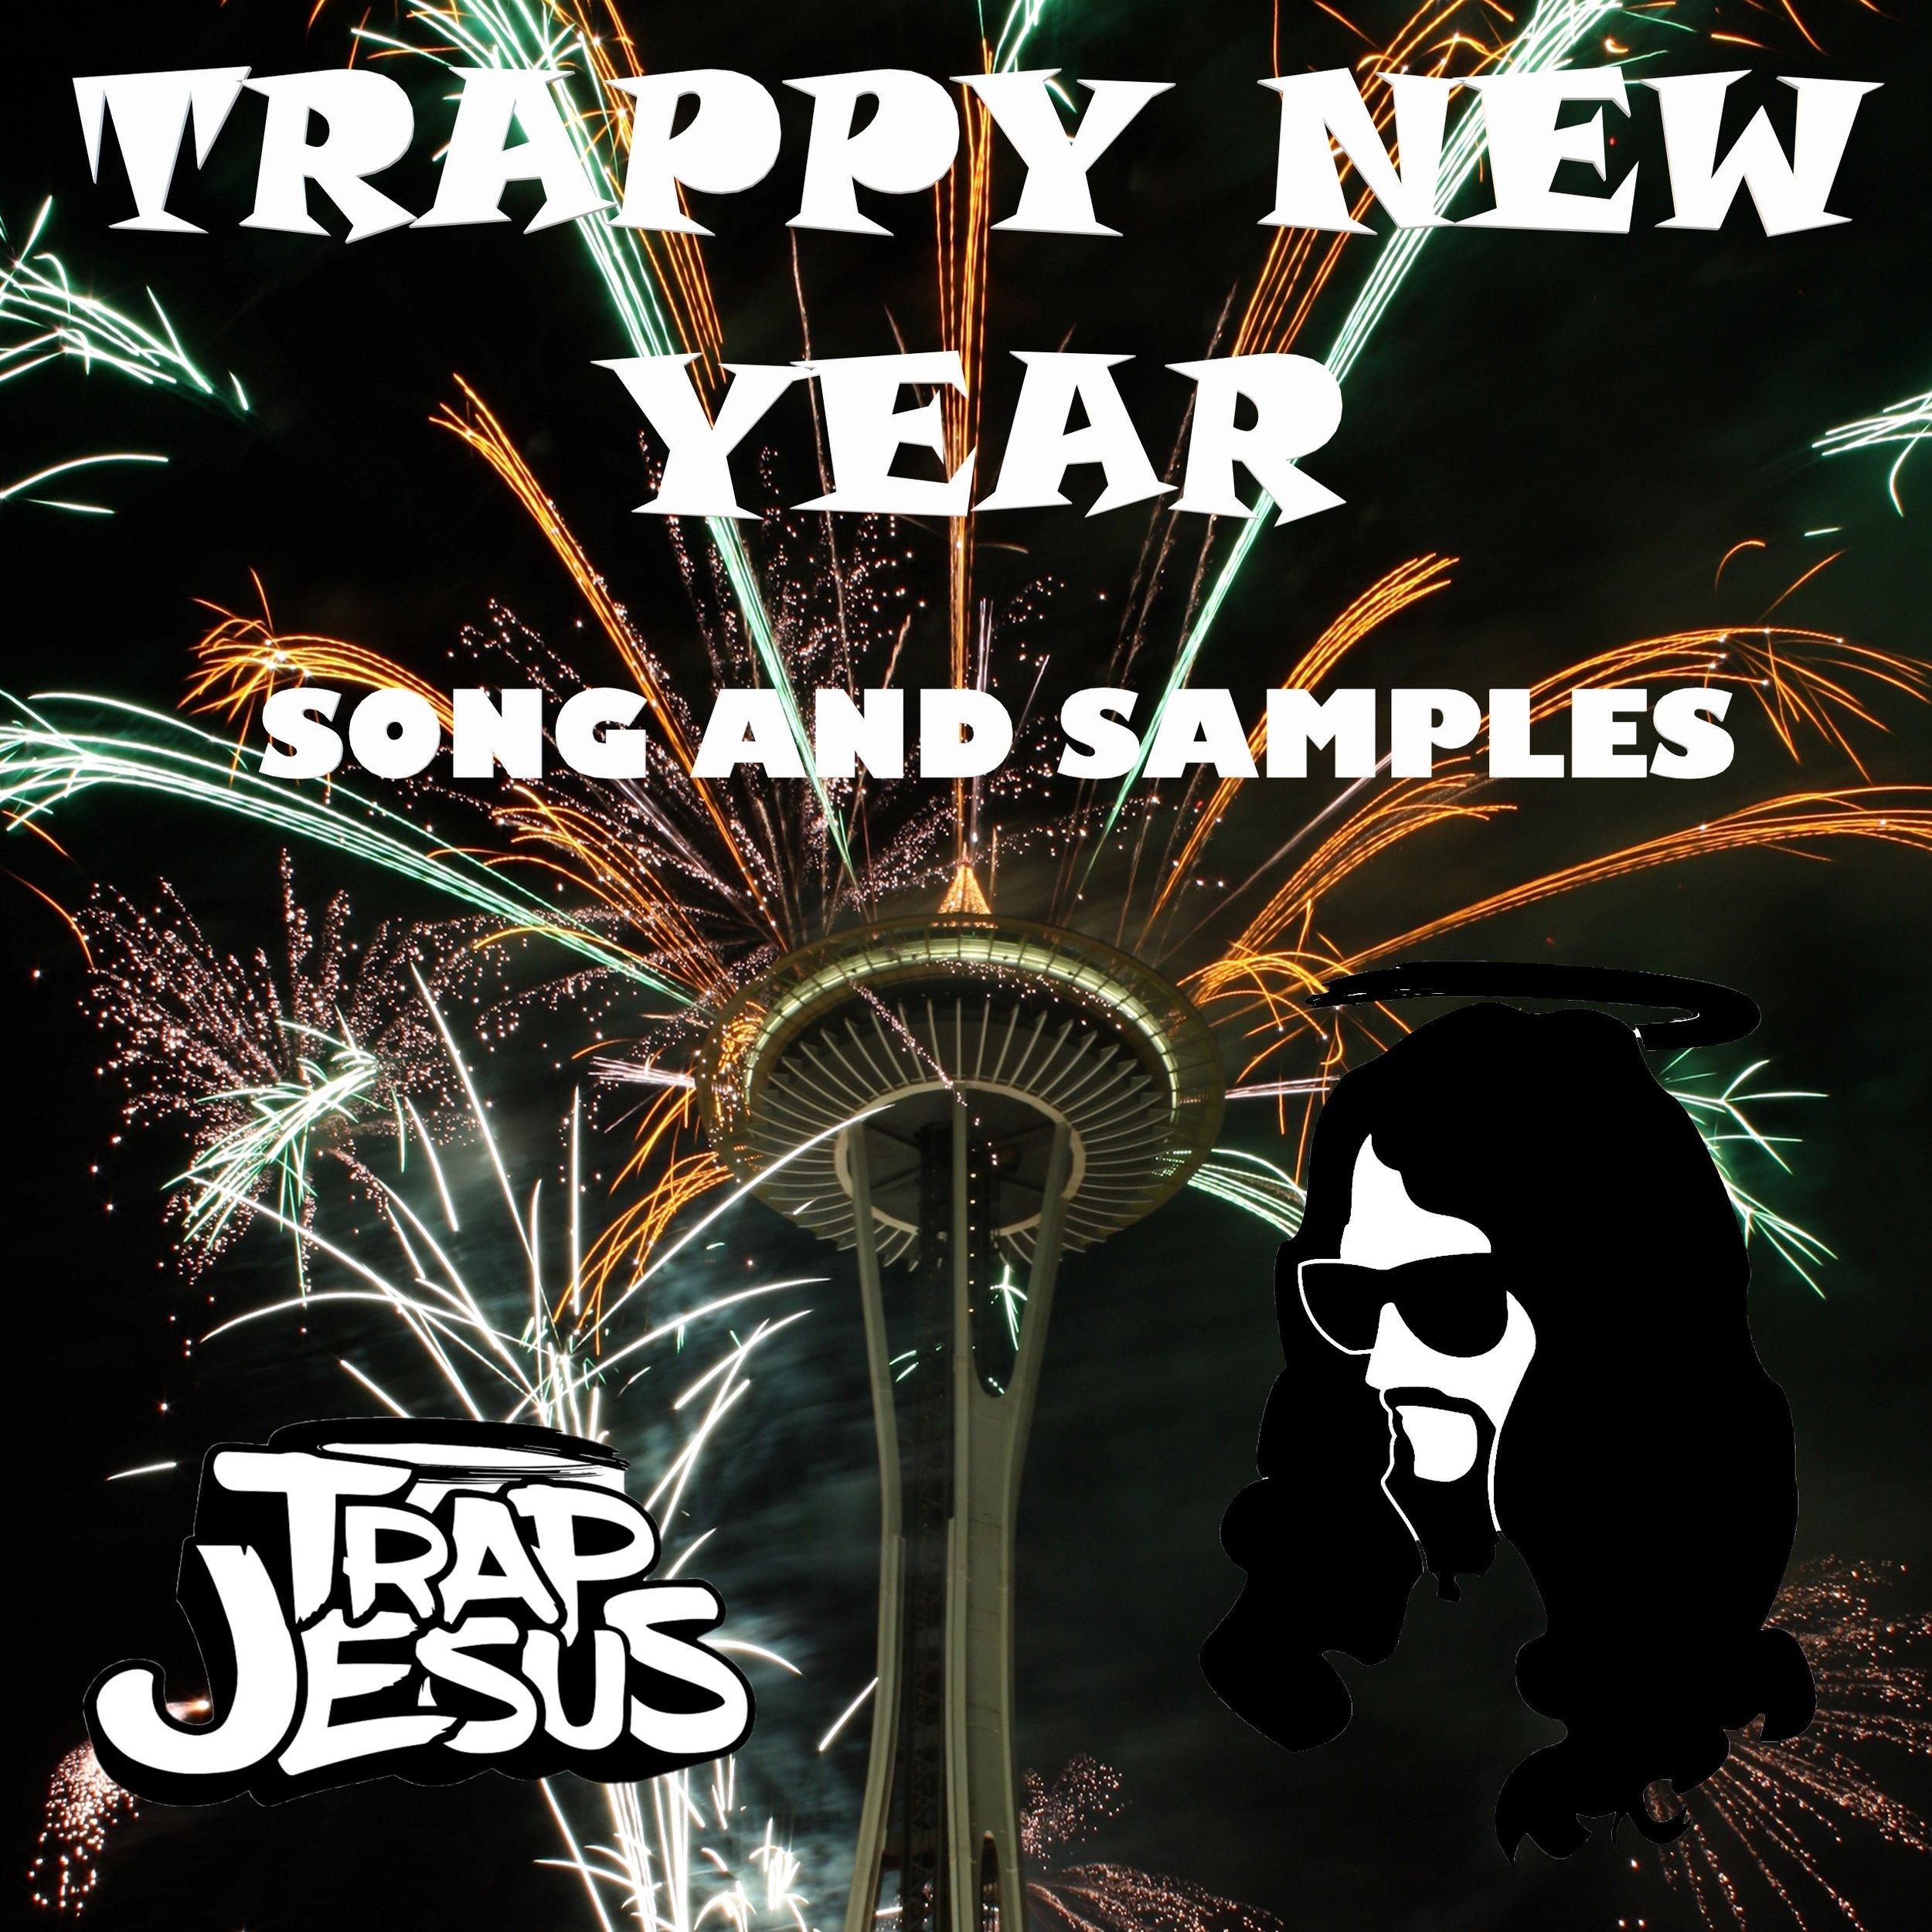 TRAPPY NEW YEAR.jpg